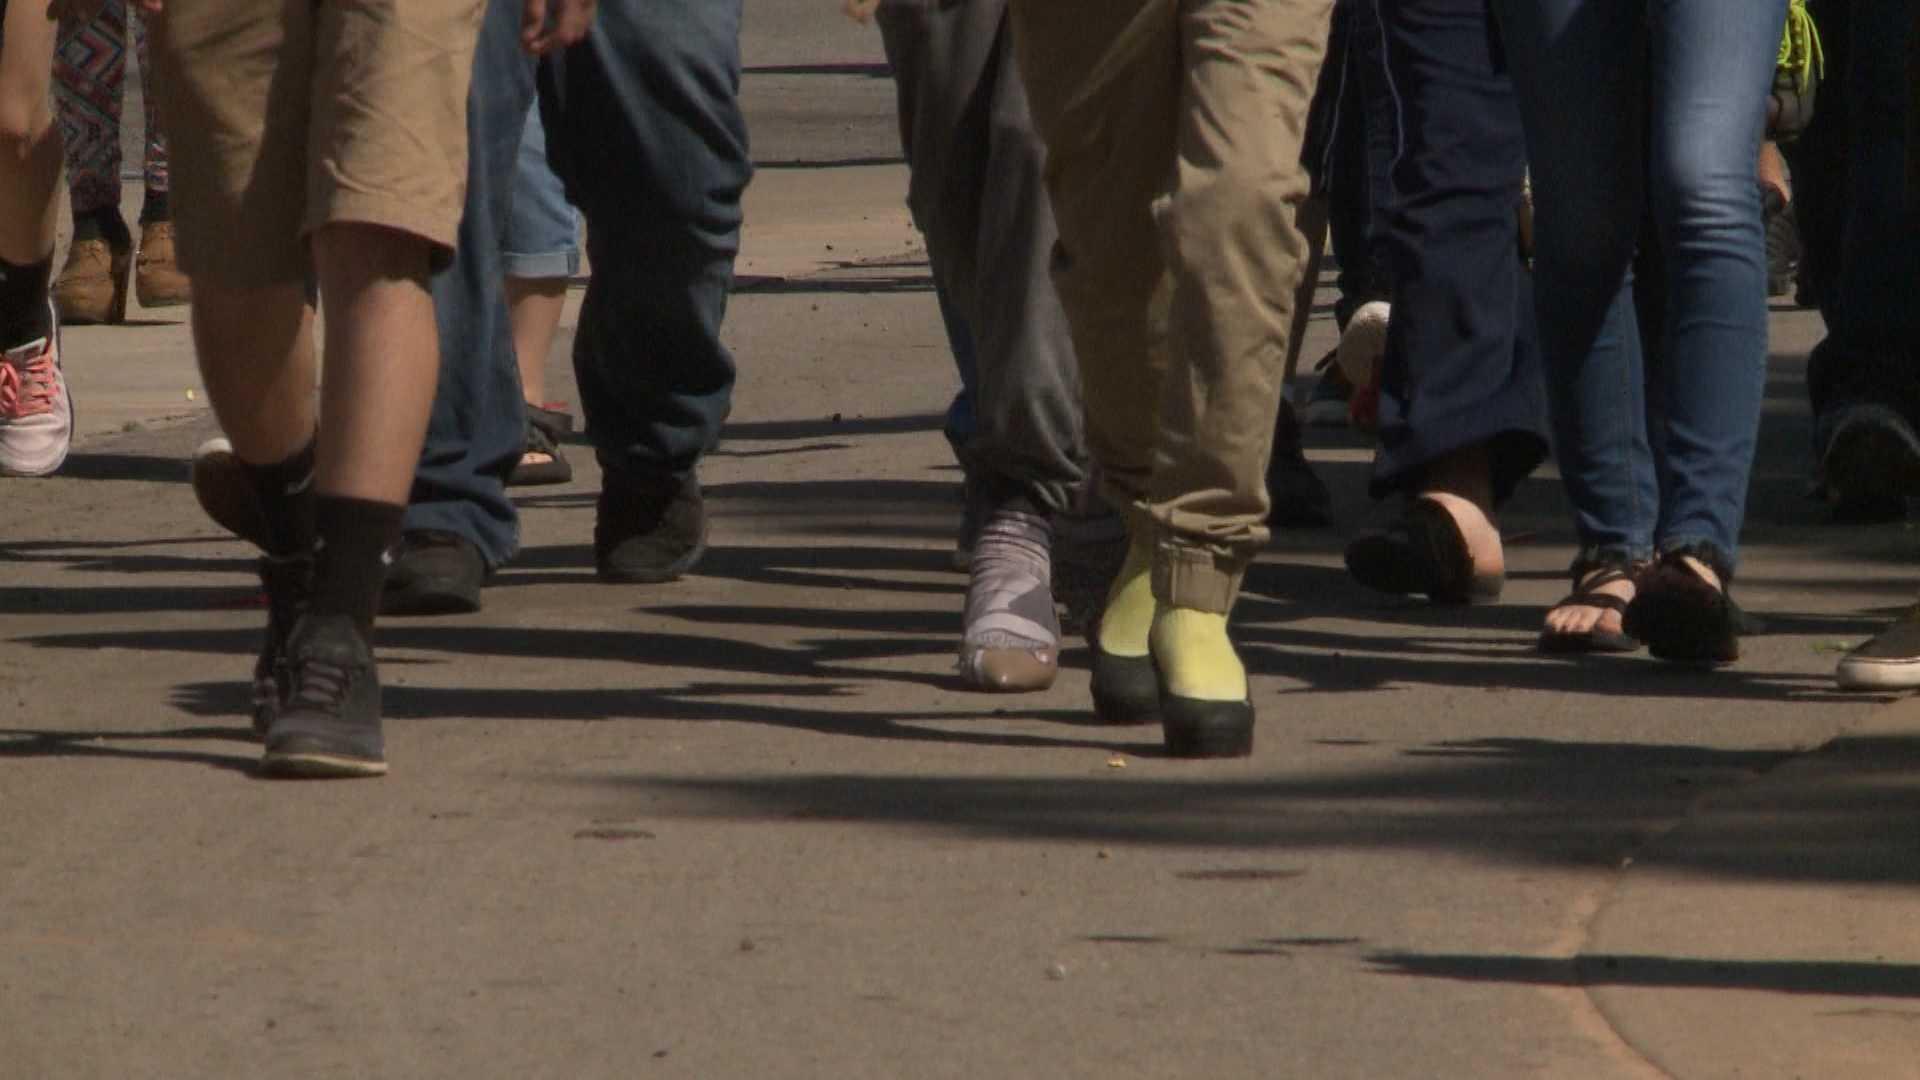 Walk in her shoes 2.jpg